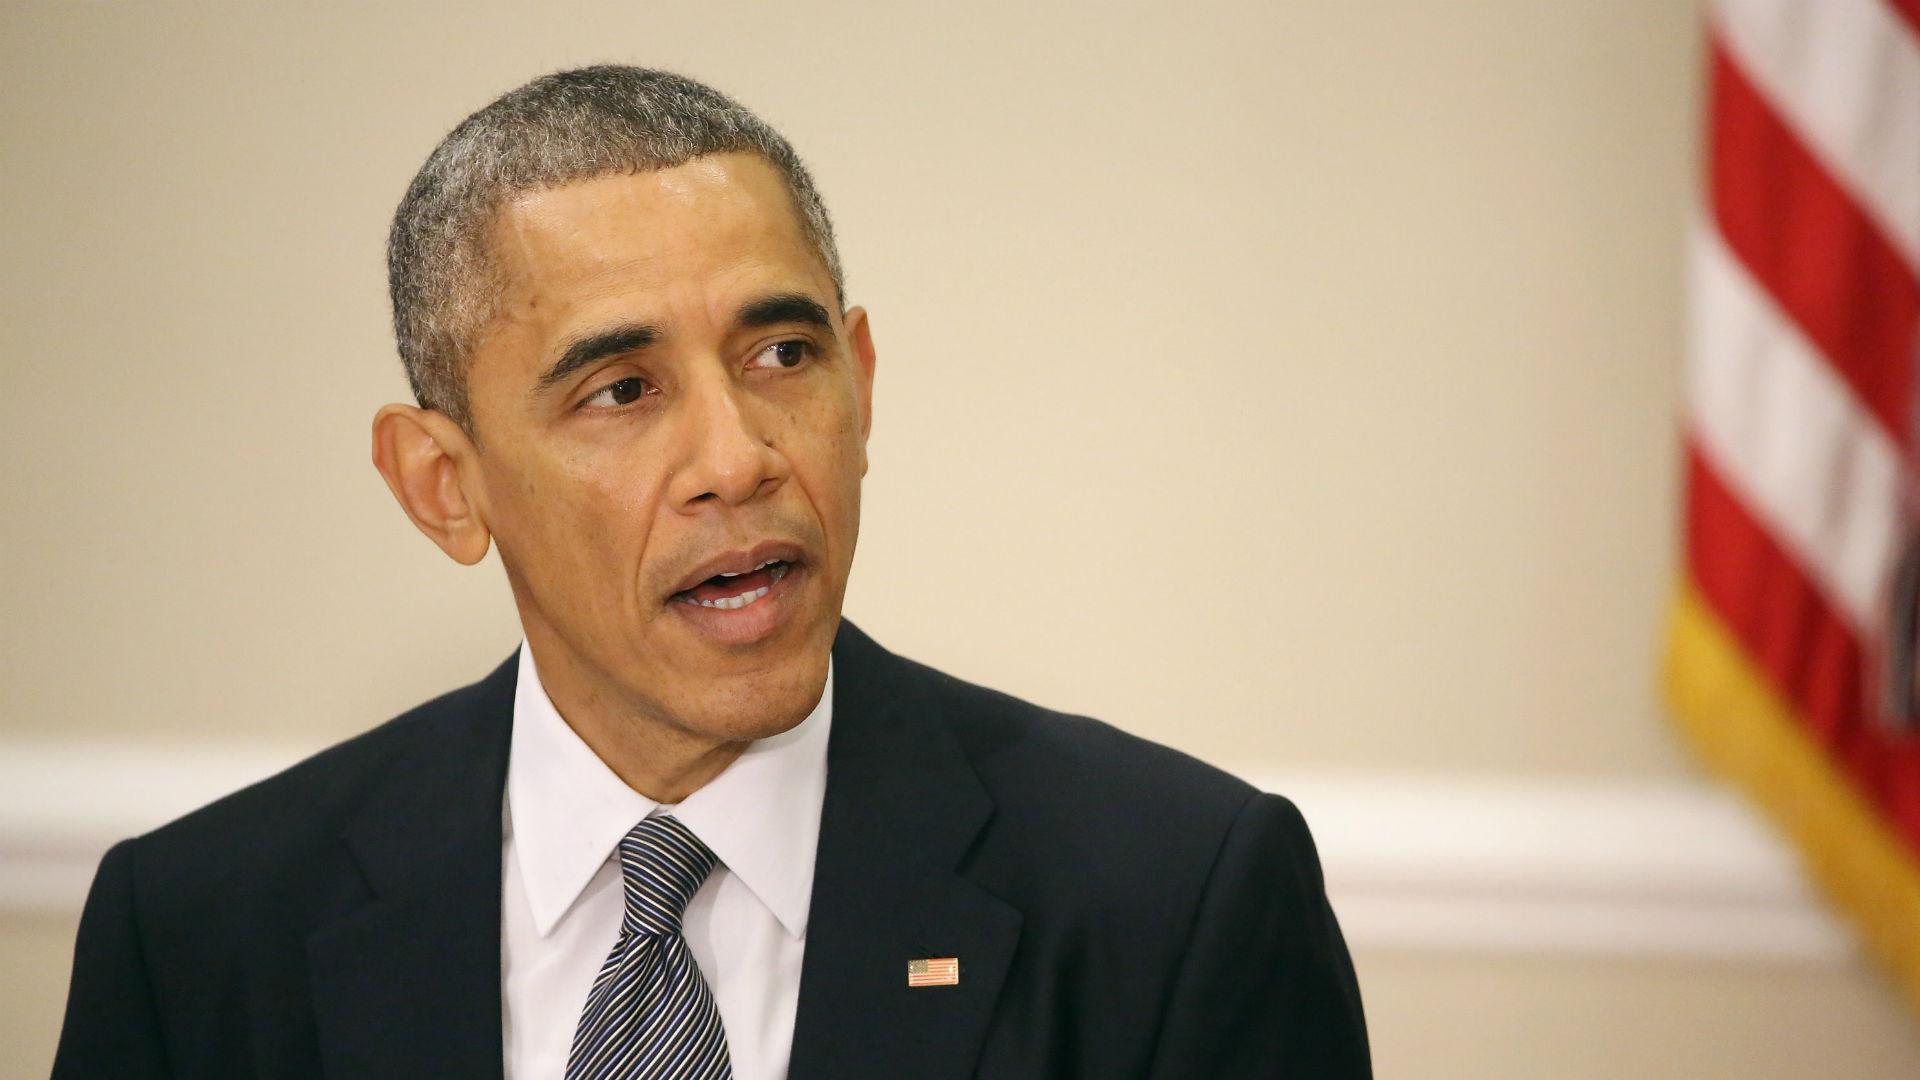 barack-obama-ftr-121214-getty.jpg